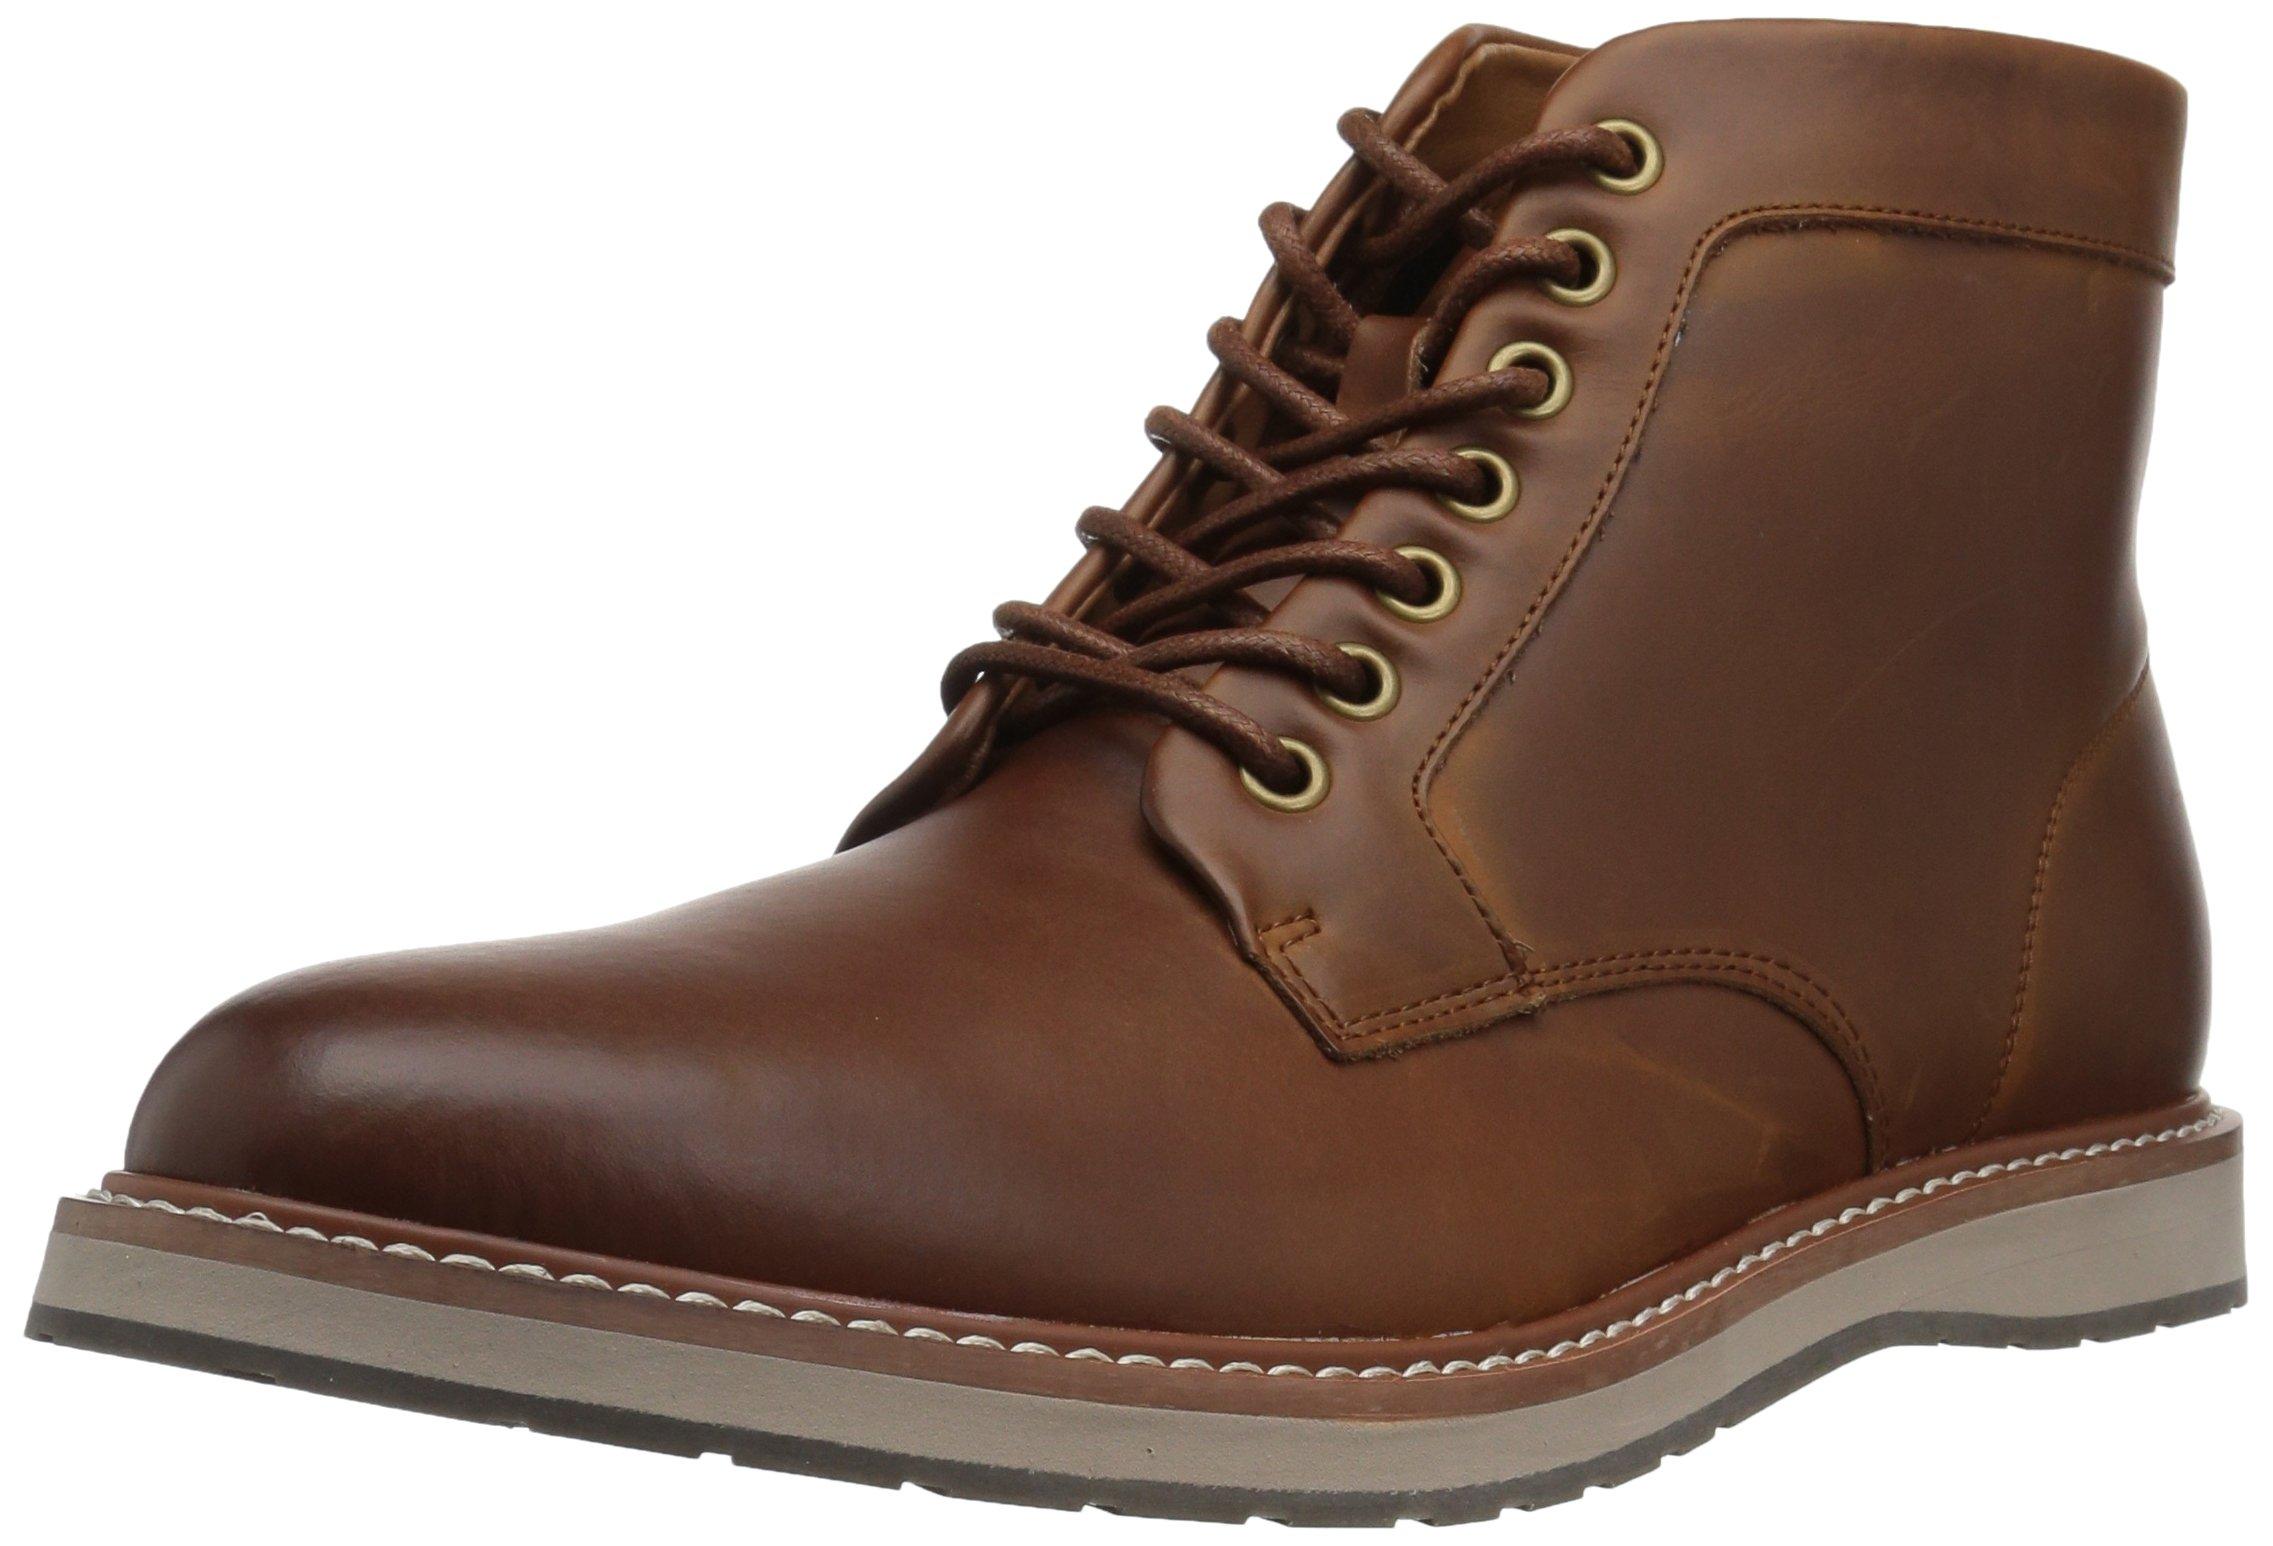 Tommy Hilfiger Men's Lari Chukka Boot, Cognac, 10 Medium US